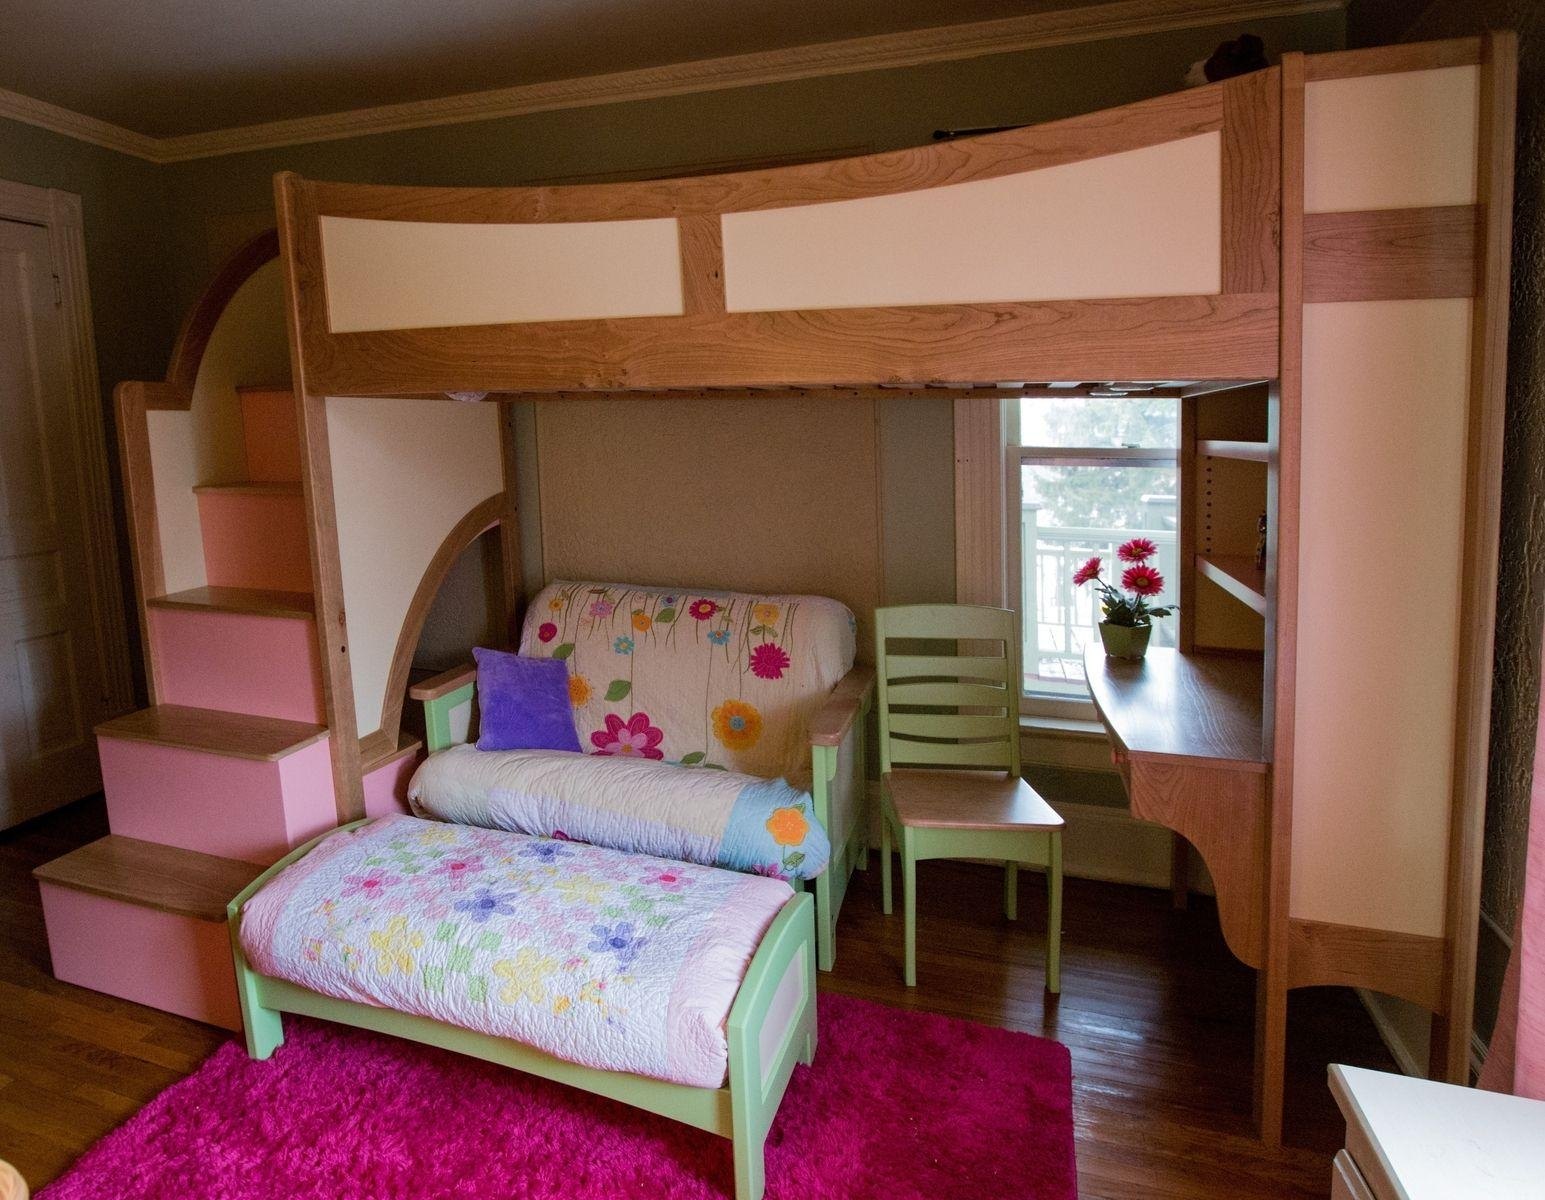 20 Photos Bunk Bed With Sofas Underneath Sofa Ideas